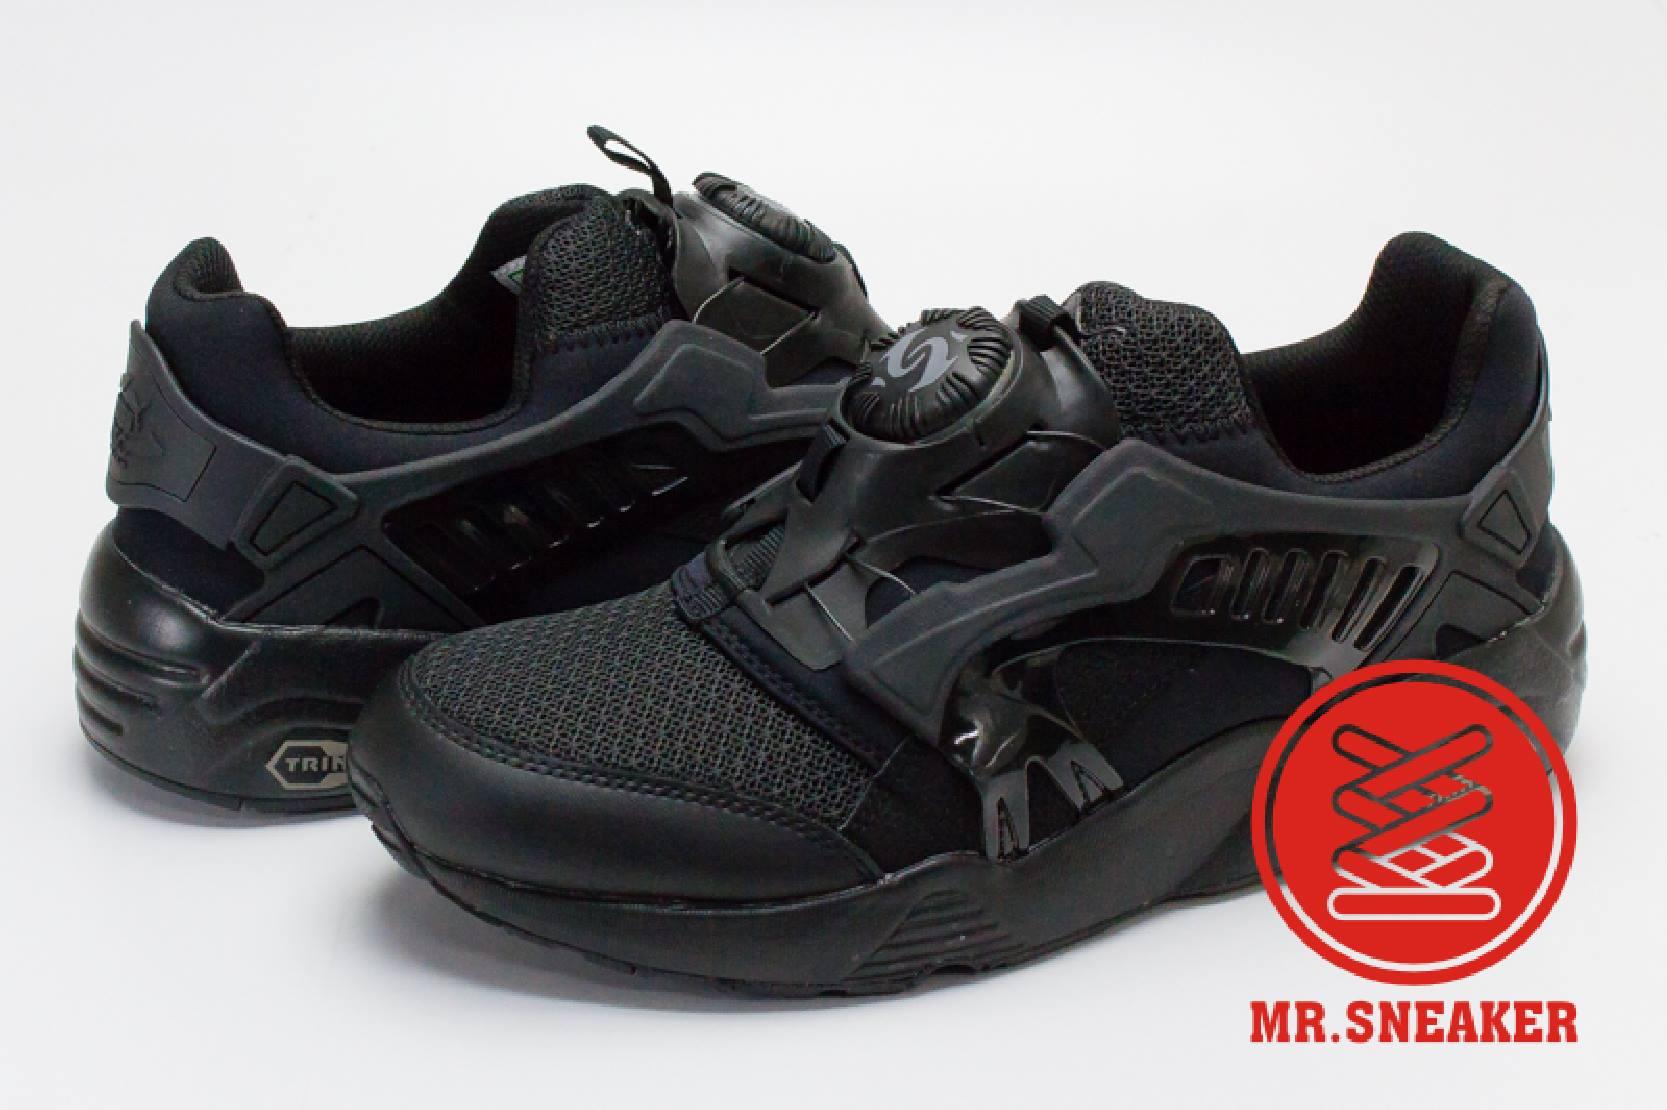 ☆Mr.Sneaker☆ Puma Disc Blaze Trinomic CT 轉盤 非武士鞋 後提把 蜂巢避震 男女段 黑